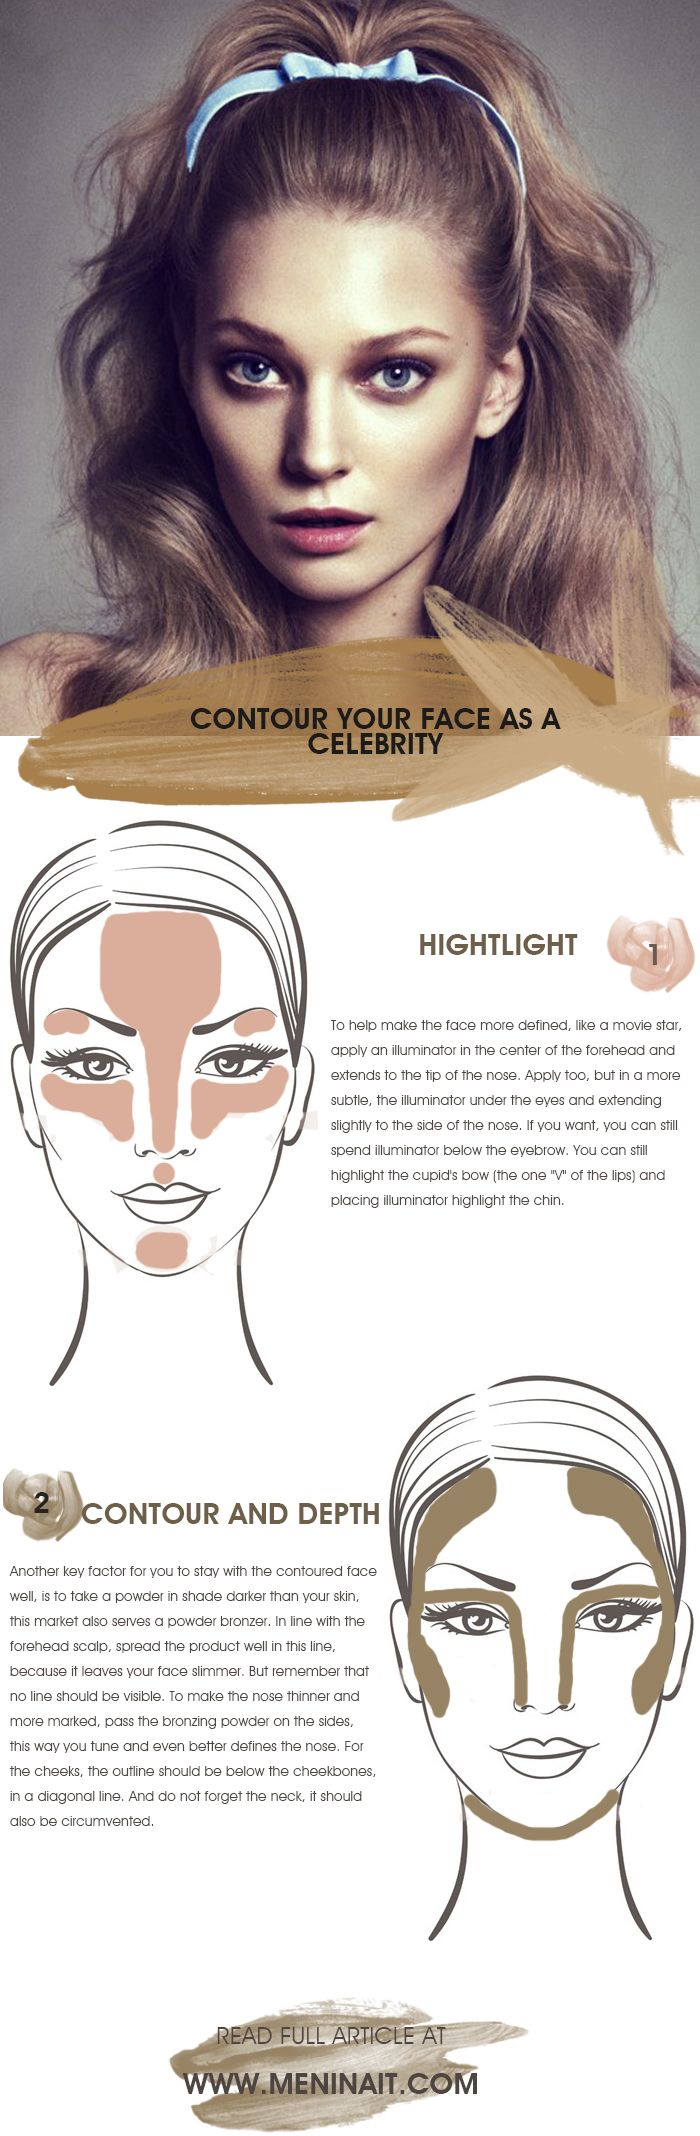 contour your face as a celebrity